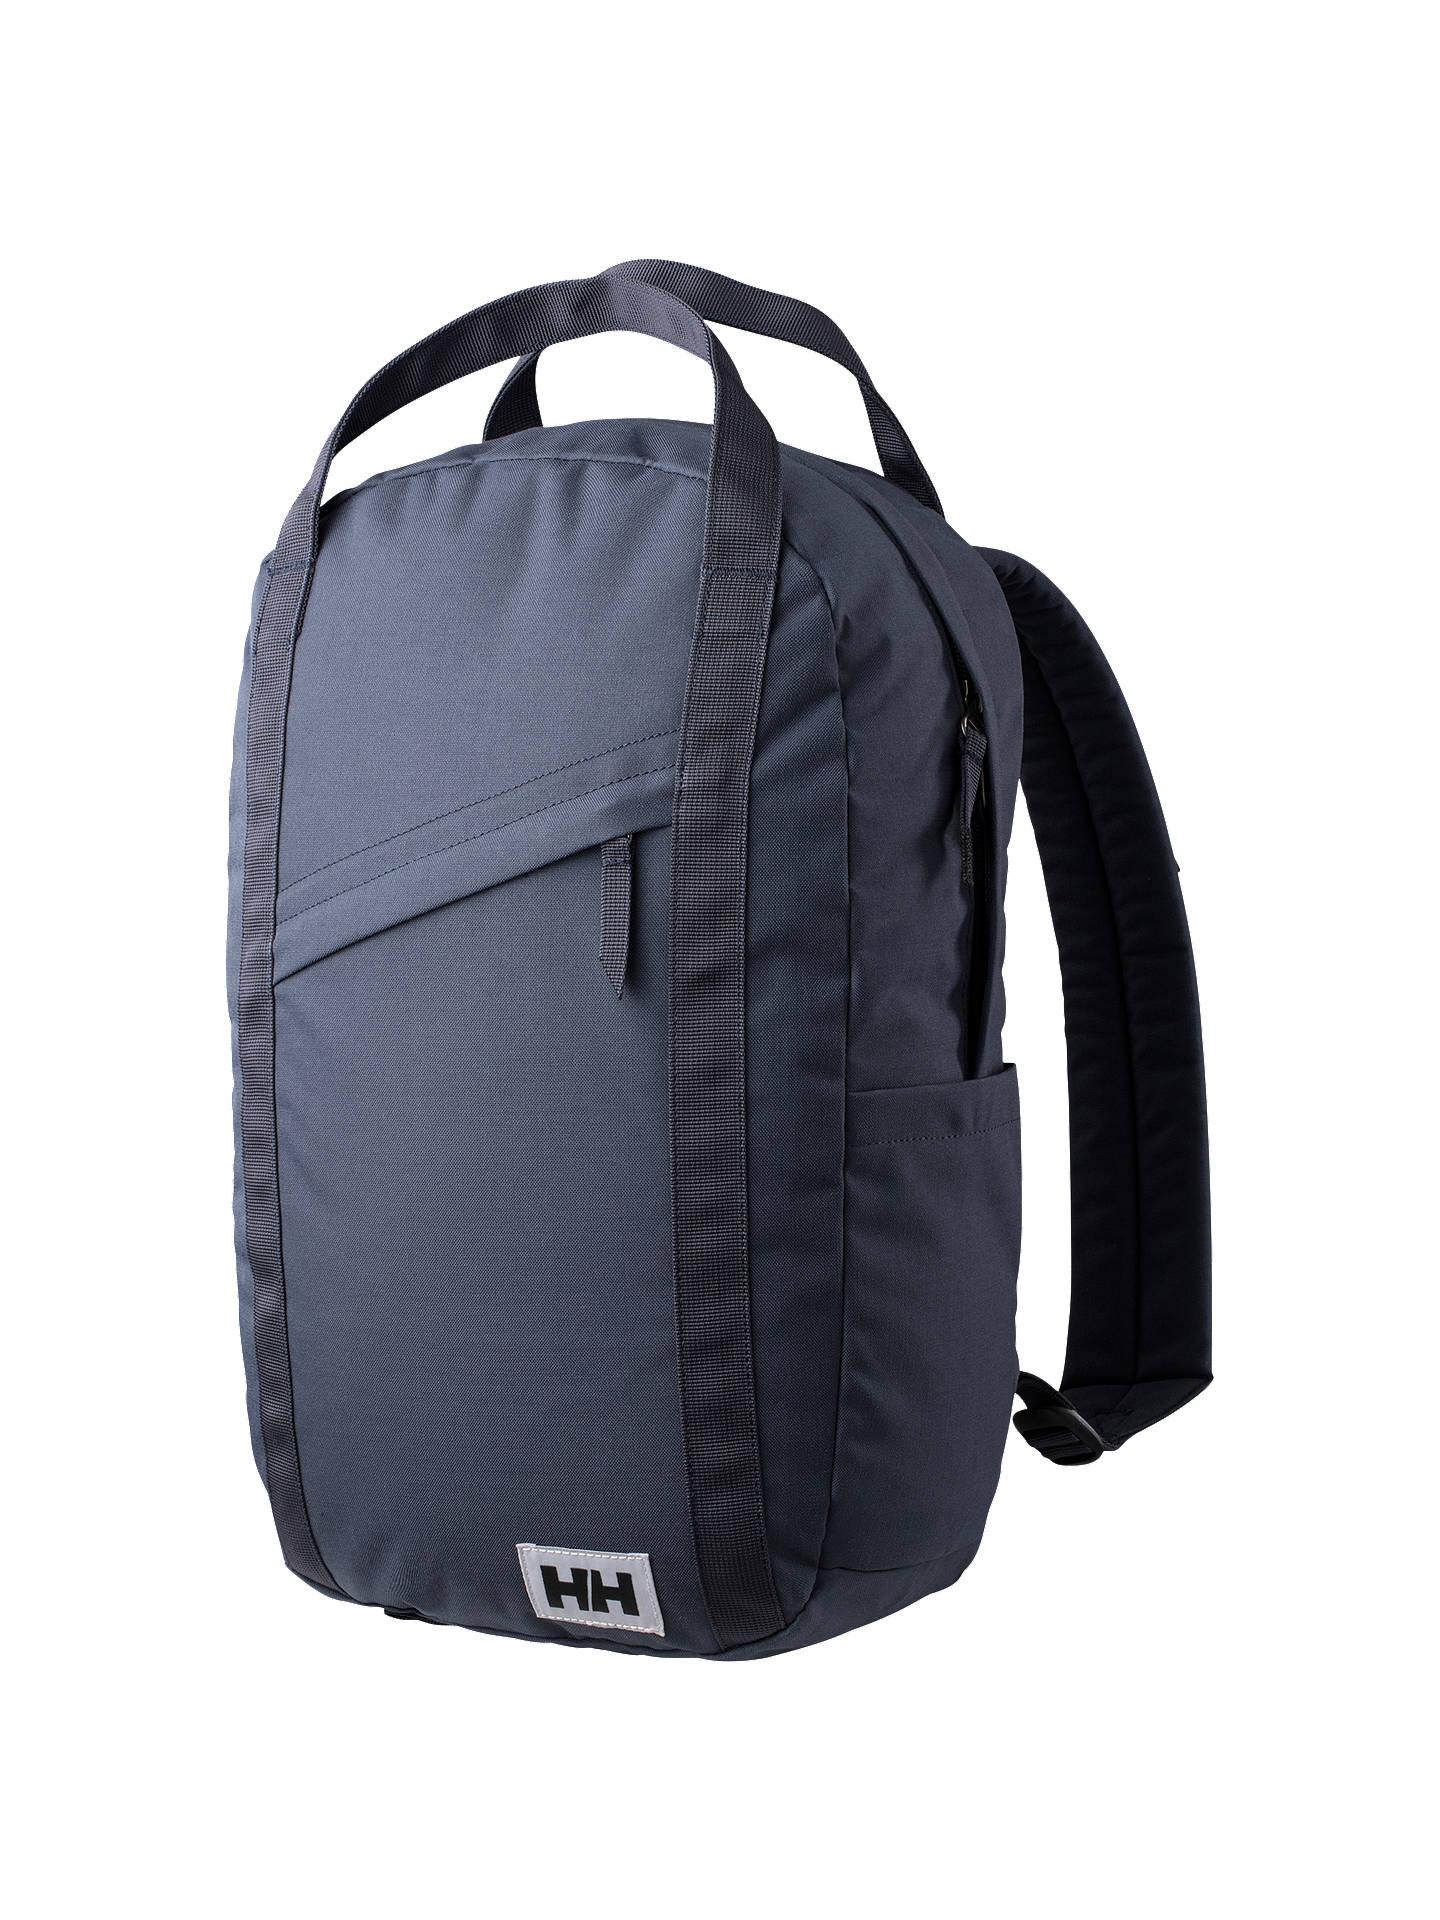 7ba0e851d1 Buy Helly Hansen Oslo 20L Backpack, Graphite Blue Online at johnlewis.com  ...